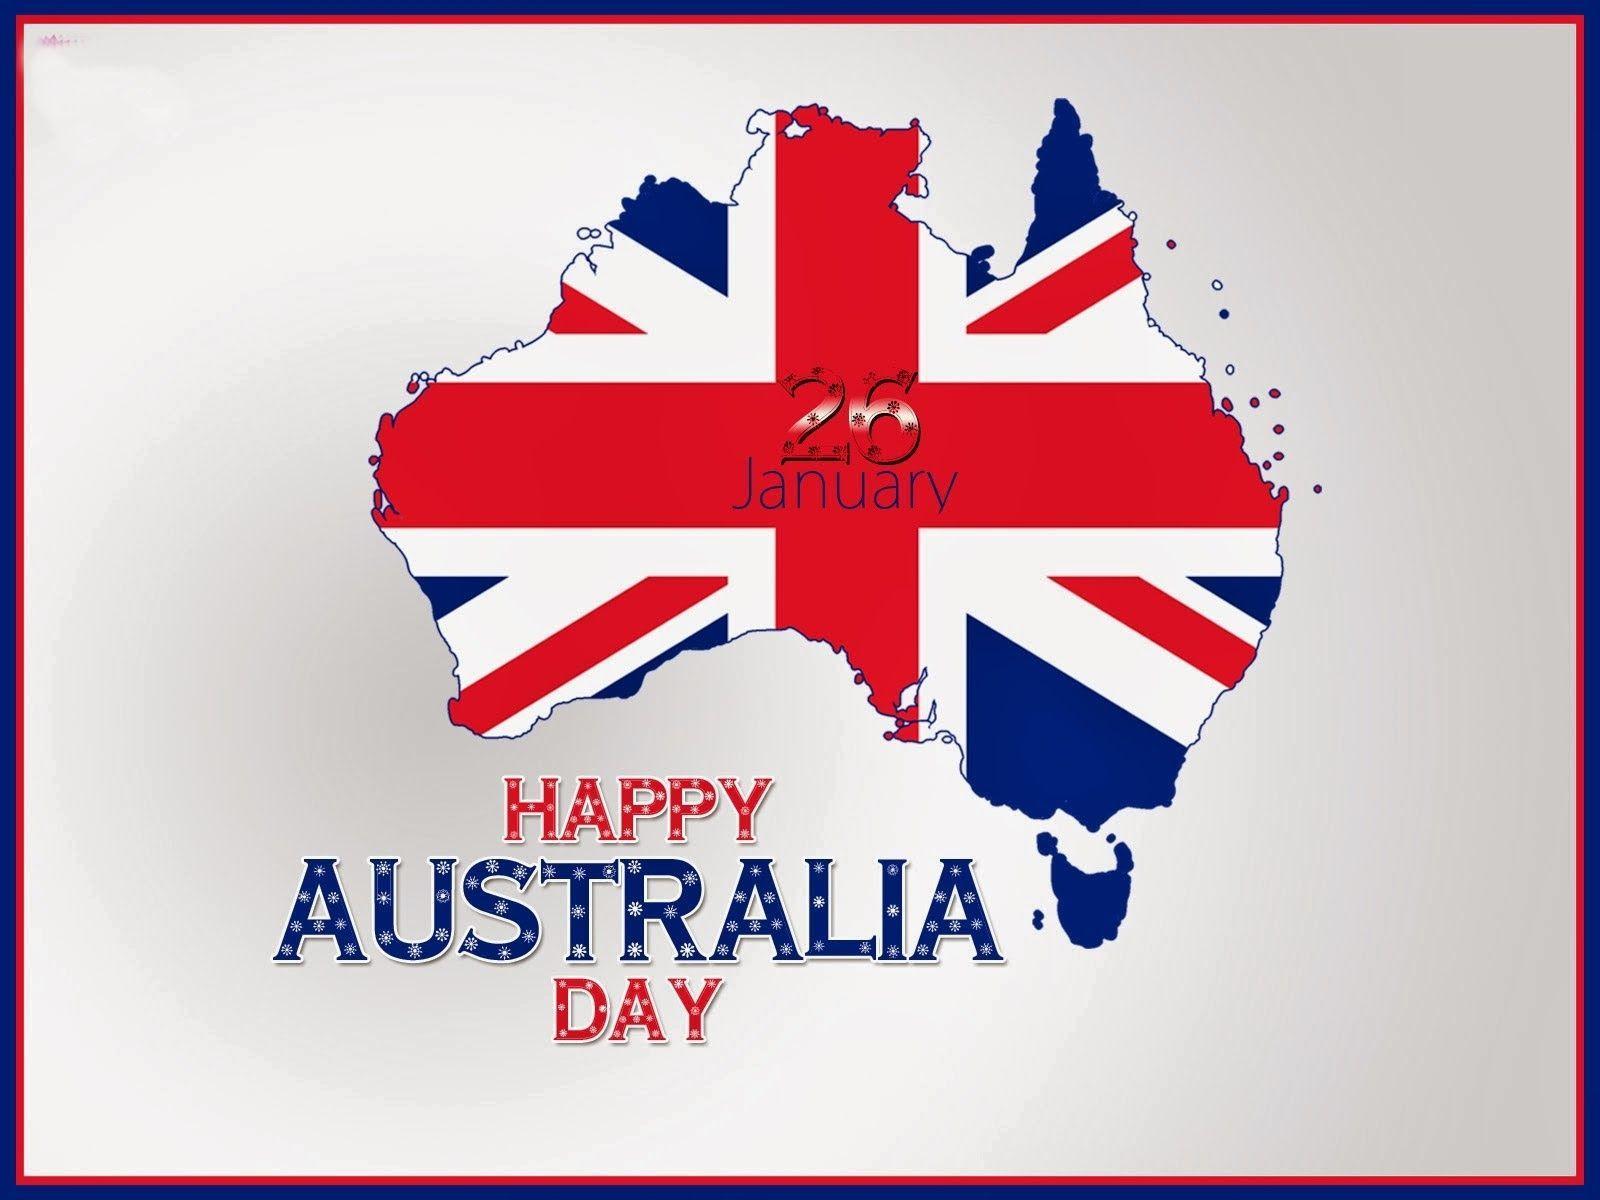 Australia Day Wallpaper